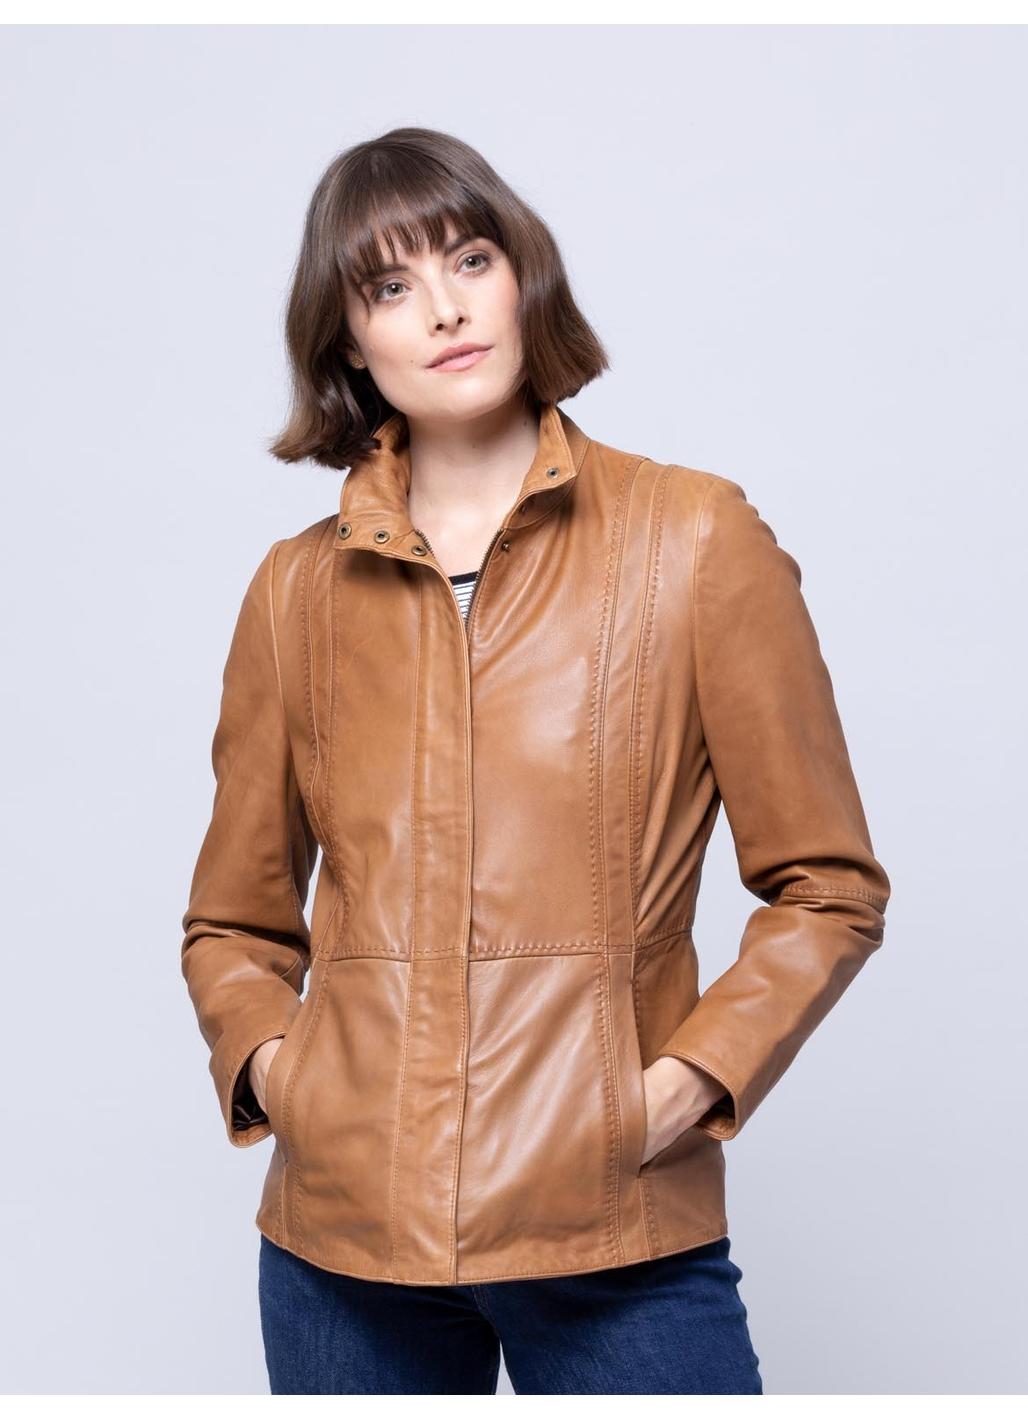 Mardale Leather Jacket in Tan